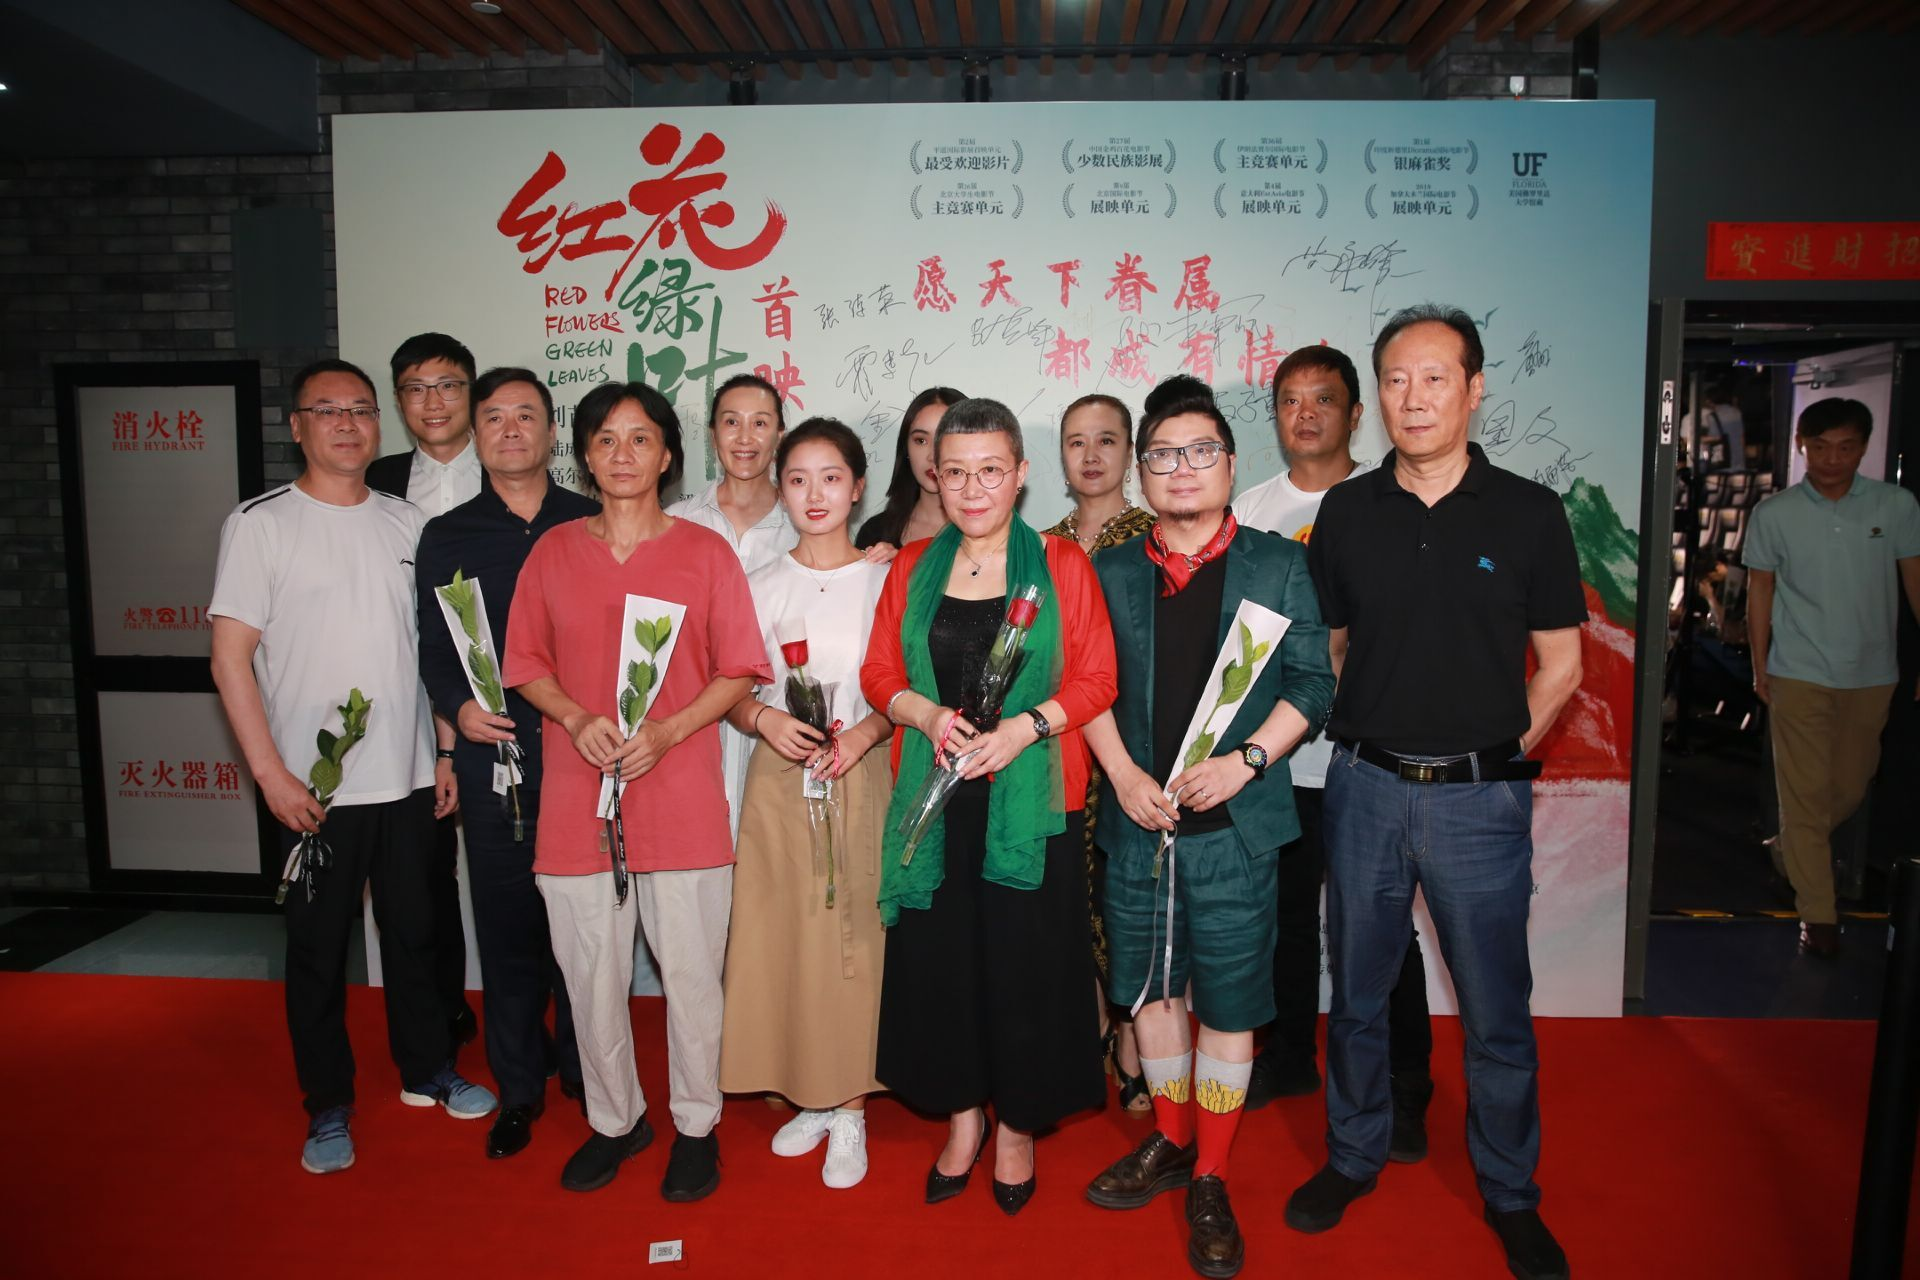 <b>《红花绿叶》北京首映 霍建起王小帅霍思燕等人现身支持</b>